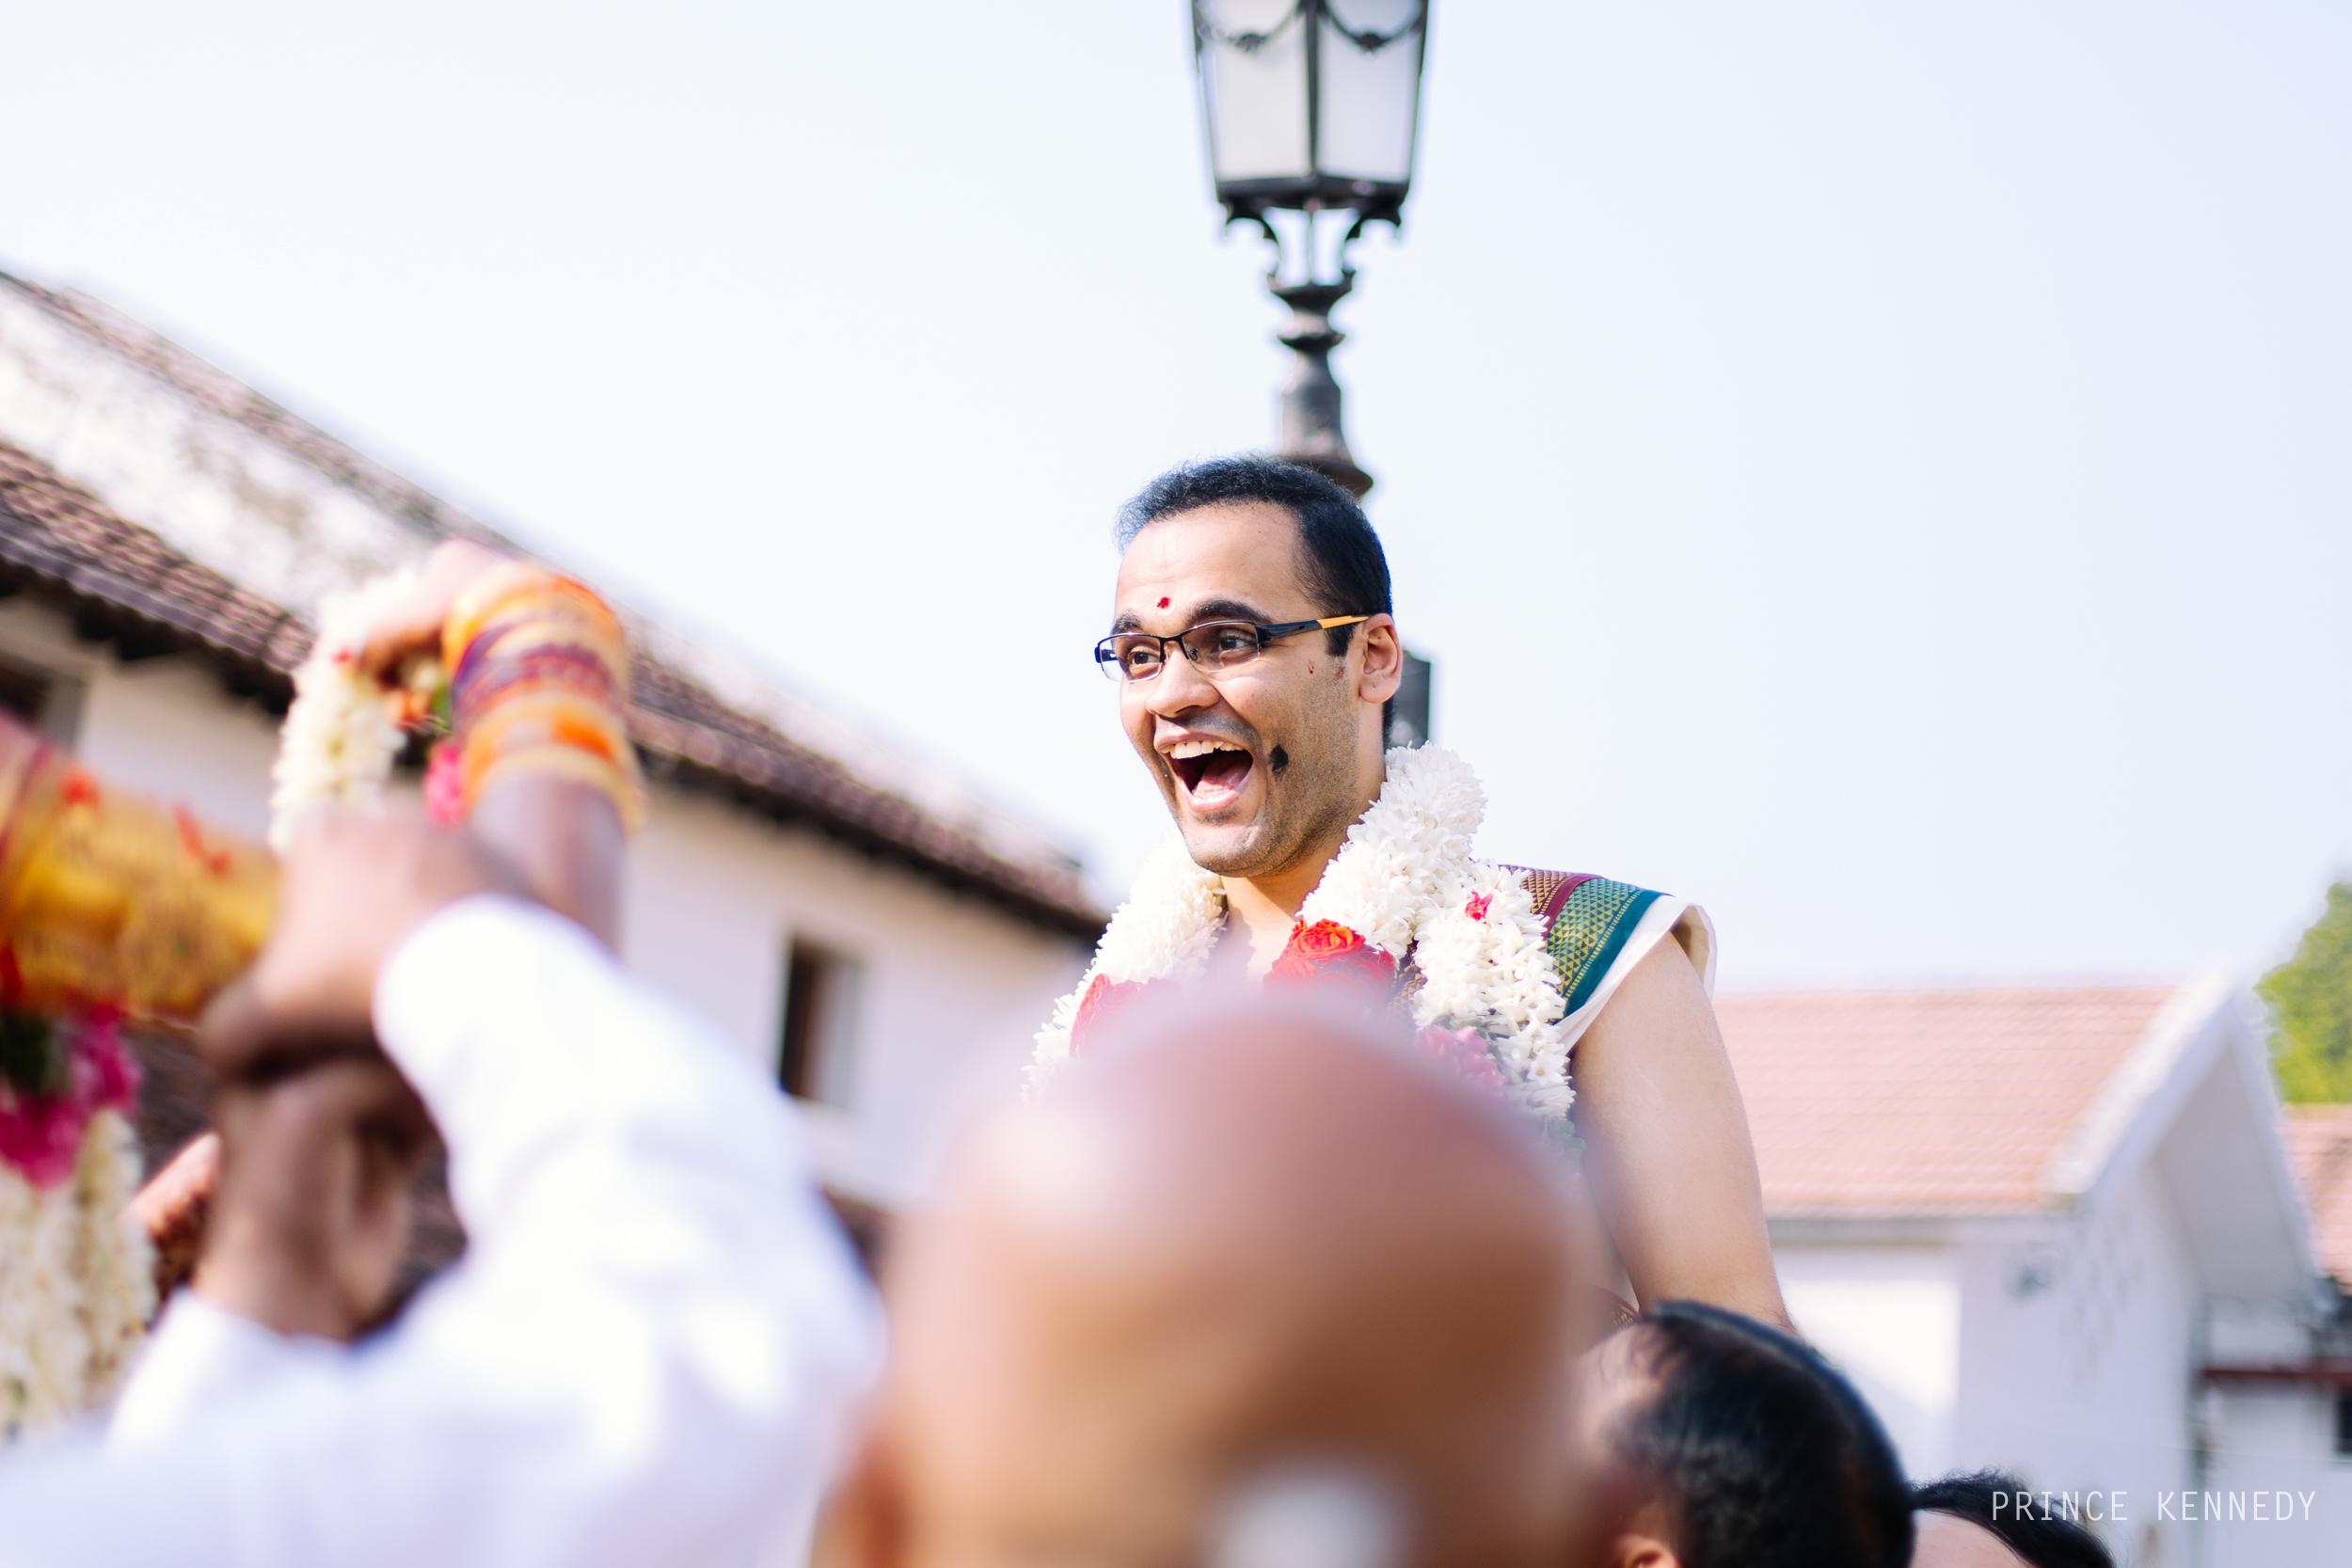 Athmajja-Nithesh-Engagement-Couple-Portrait-Portraiture-Wedding-Couple-Portrait-Chennai-Photographer-Candid-Photography-Destination-Best-Prince-Kennedy-Photography-87.jpg